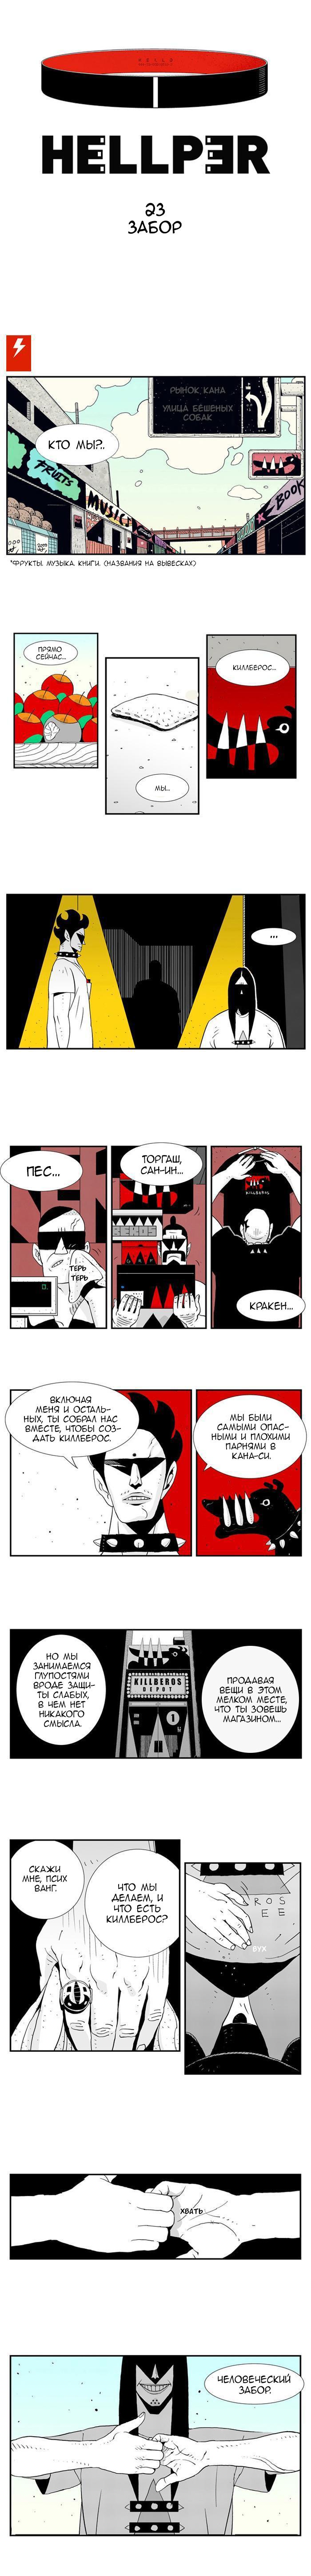 https://r1.ninemanga.com/comics/pic2/61/23549/320222/1489280983641.jpg Page 1